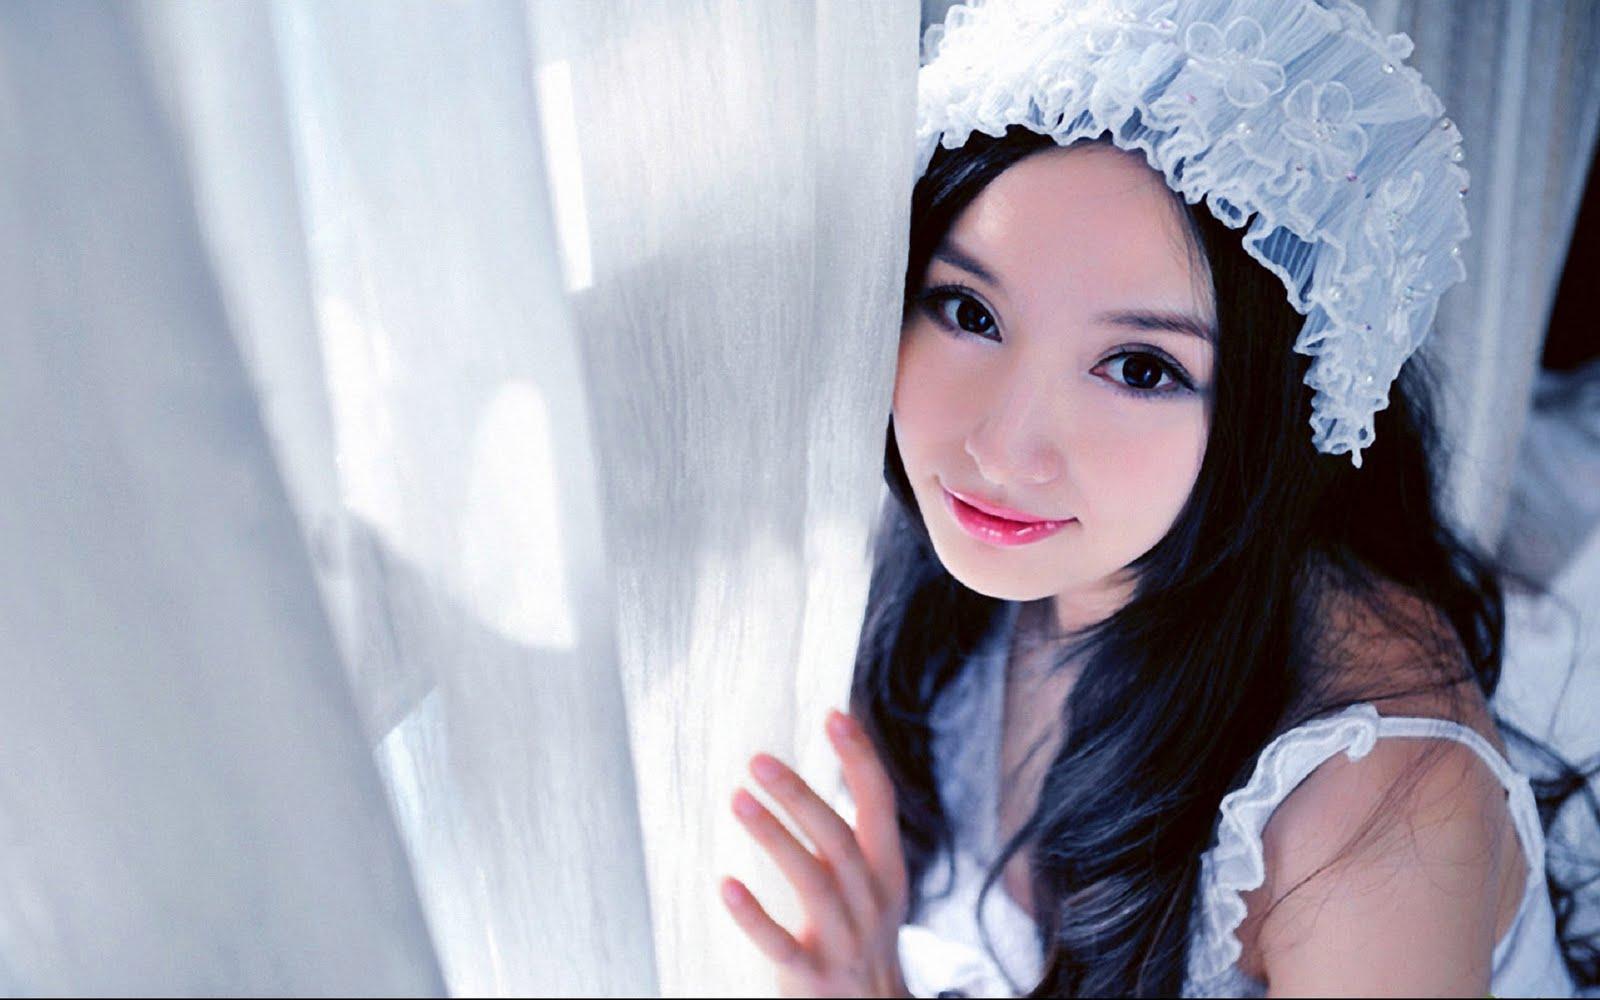 Cute And Beautiful Girls Wallpaper Pack 22 Wallpapers 1600x1000